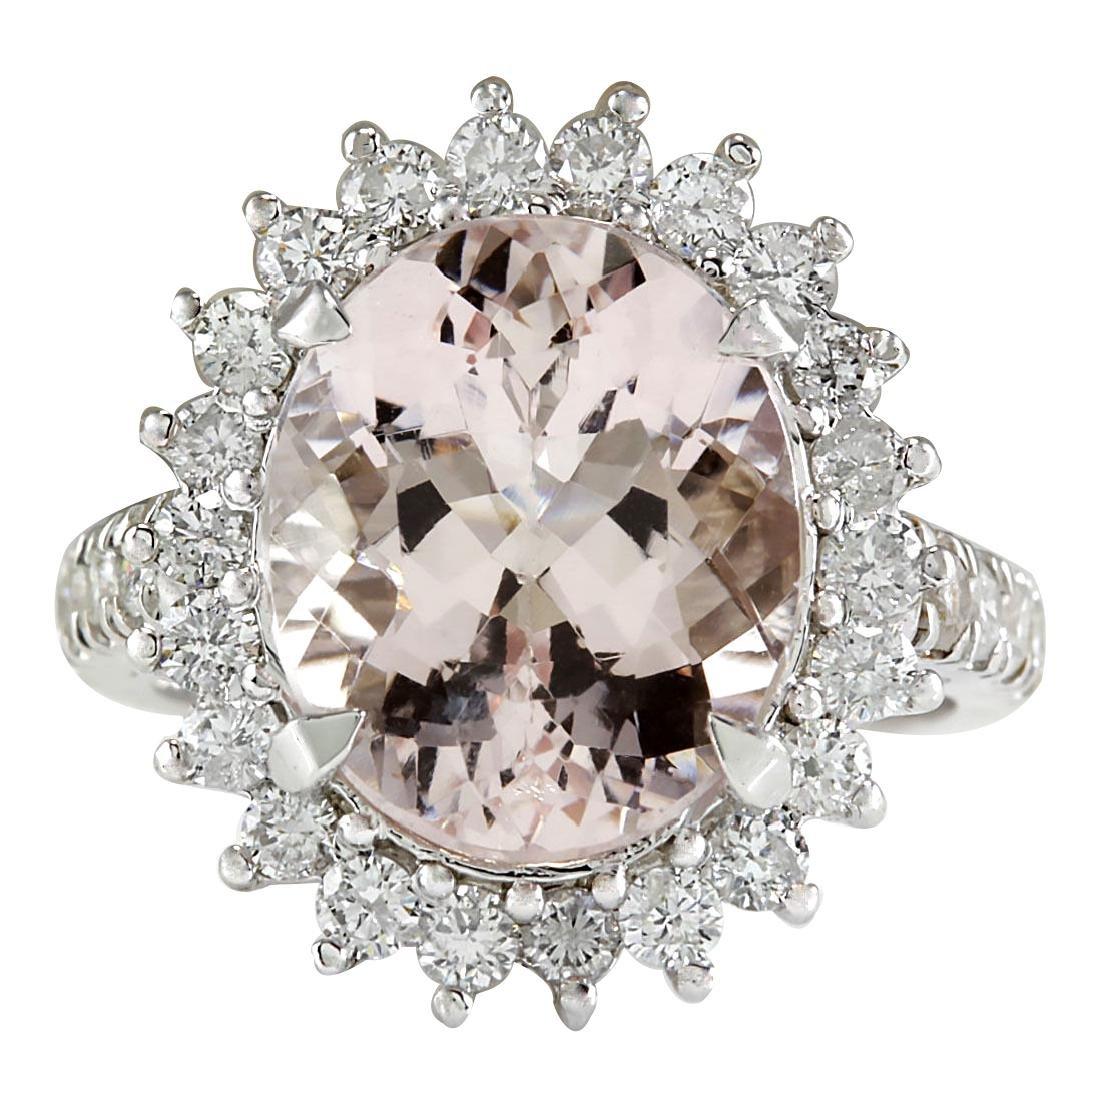 7.34CTW Natural Morganite And Diamond Ring In 18K White